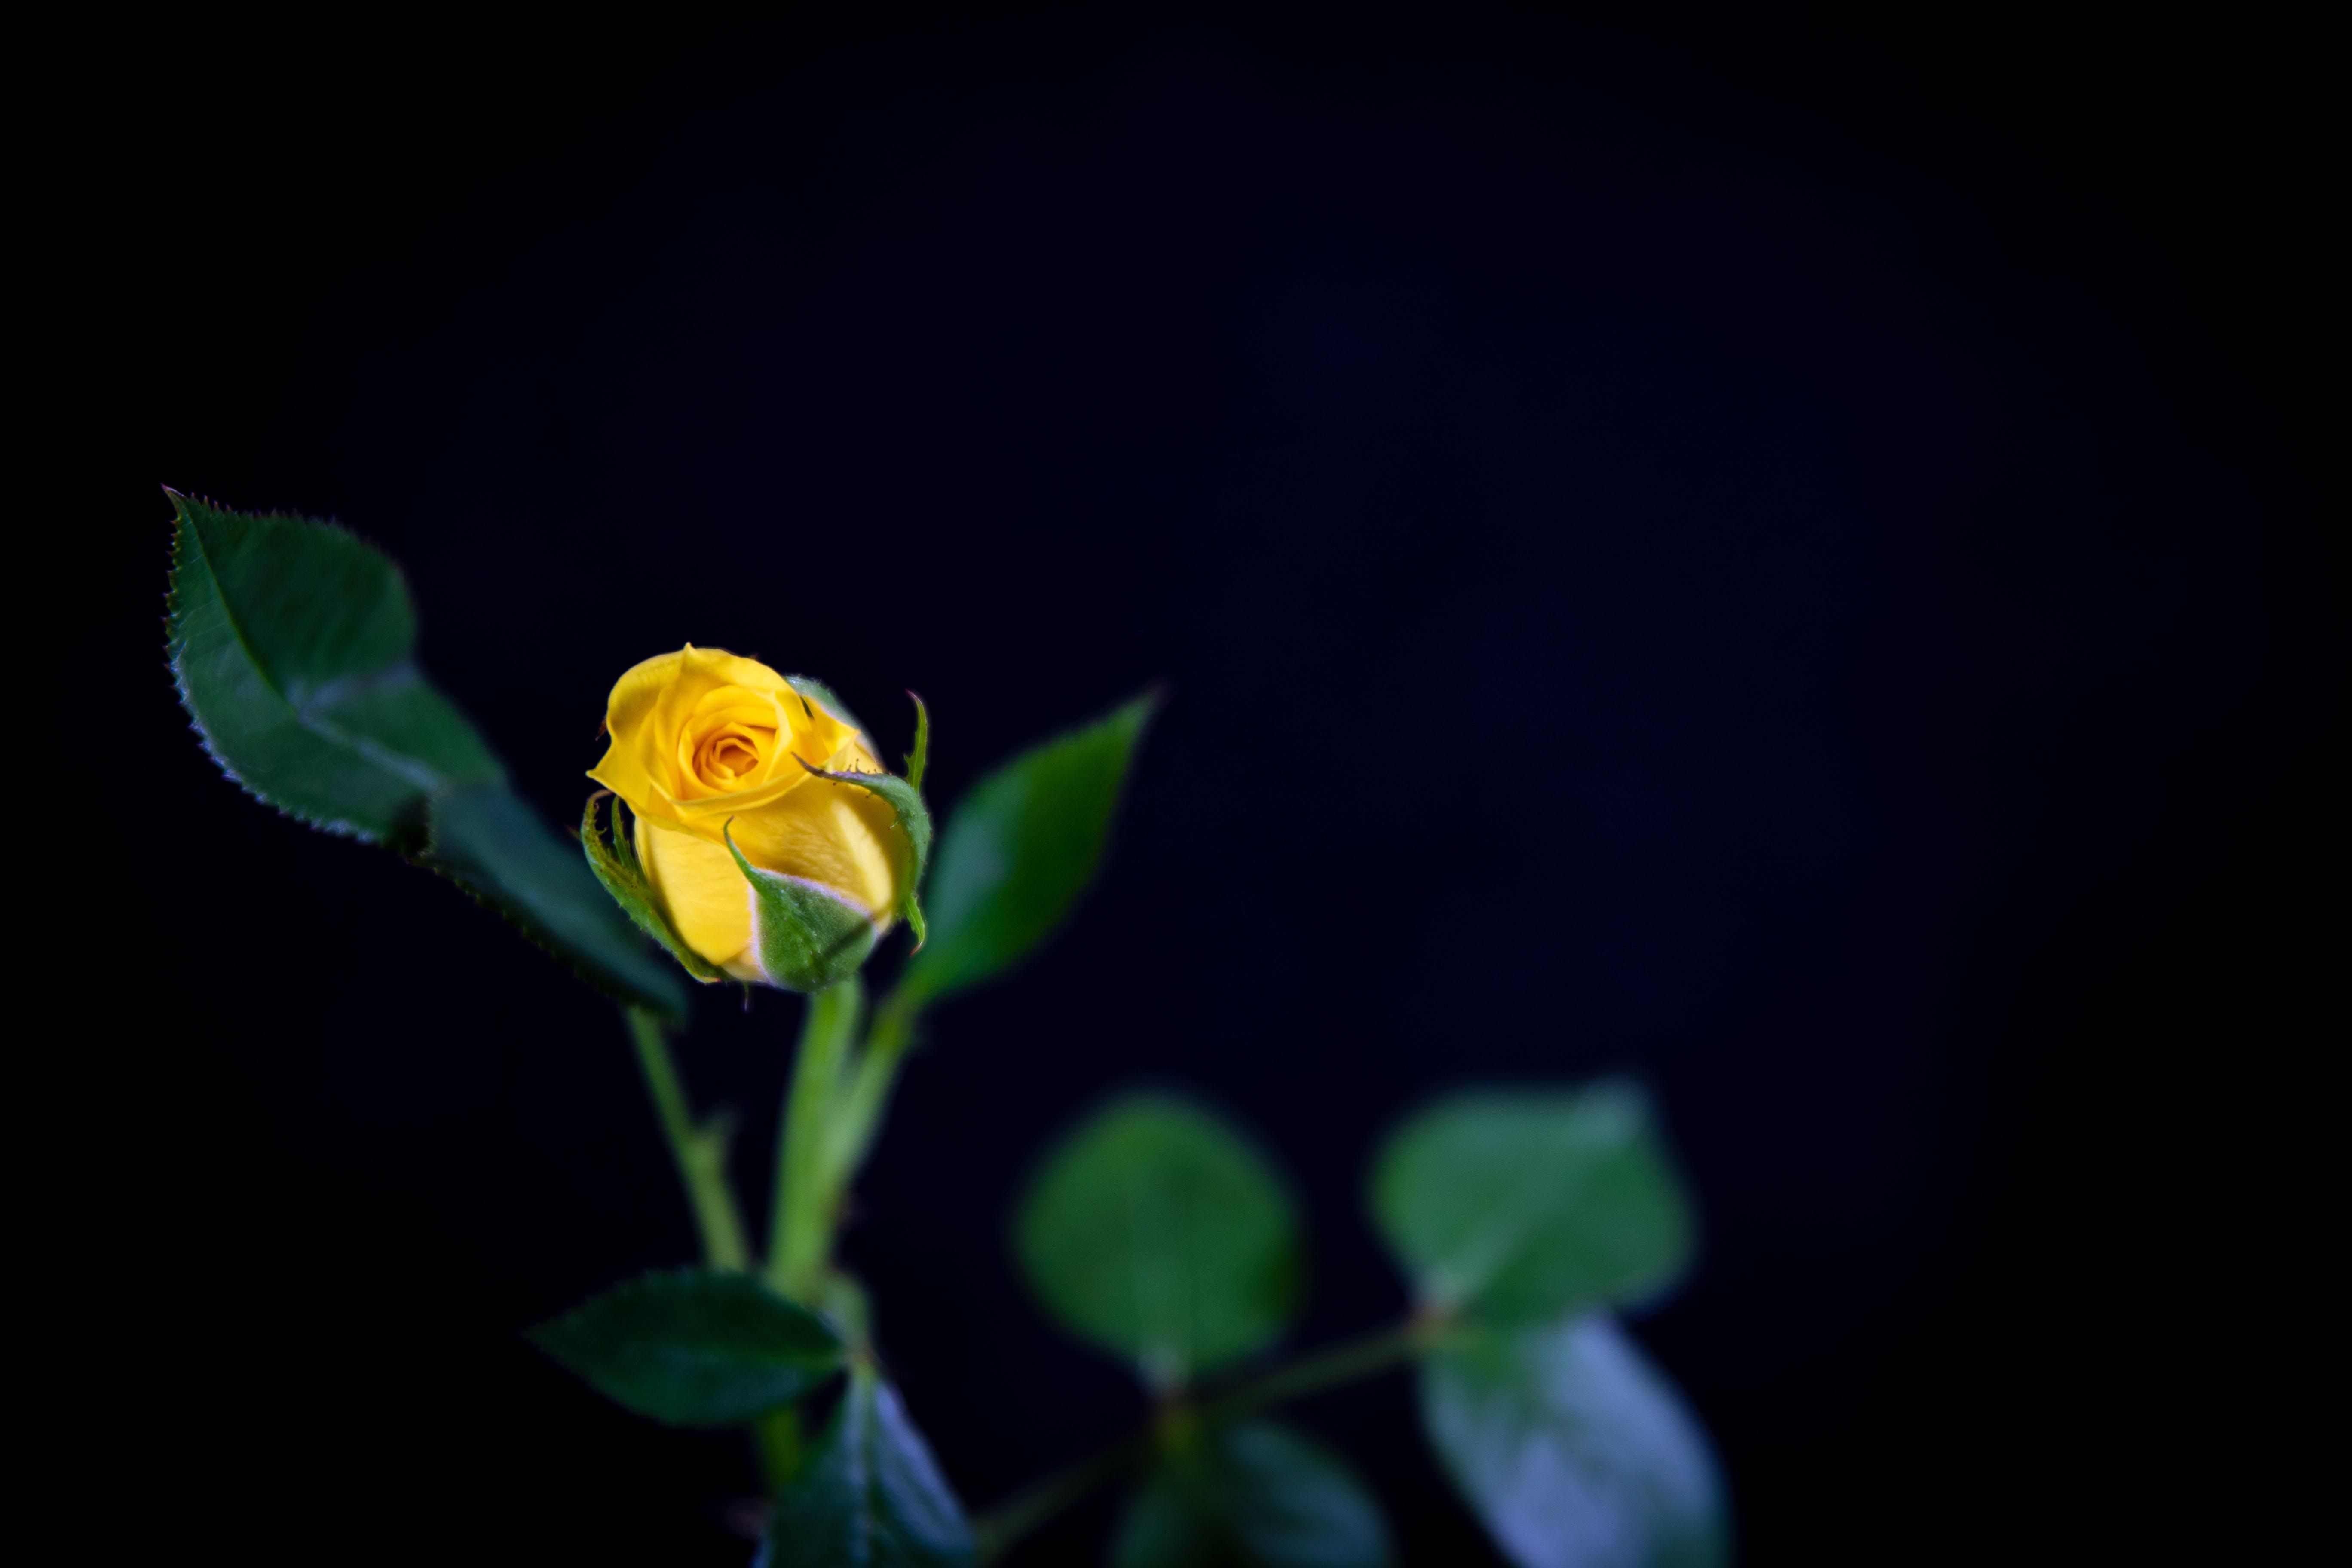 Yellow Hybrid Tea Rose Flower in Bloom